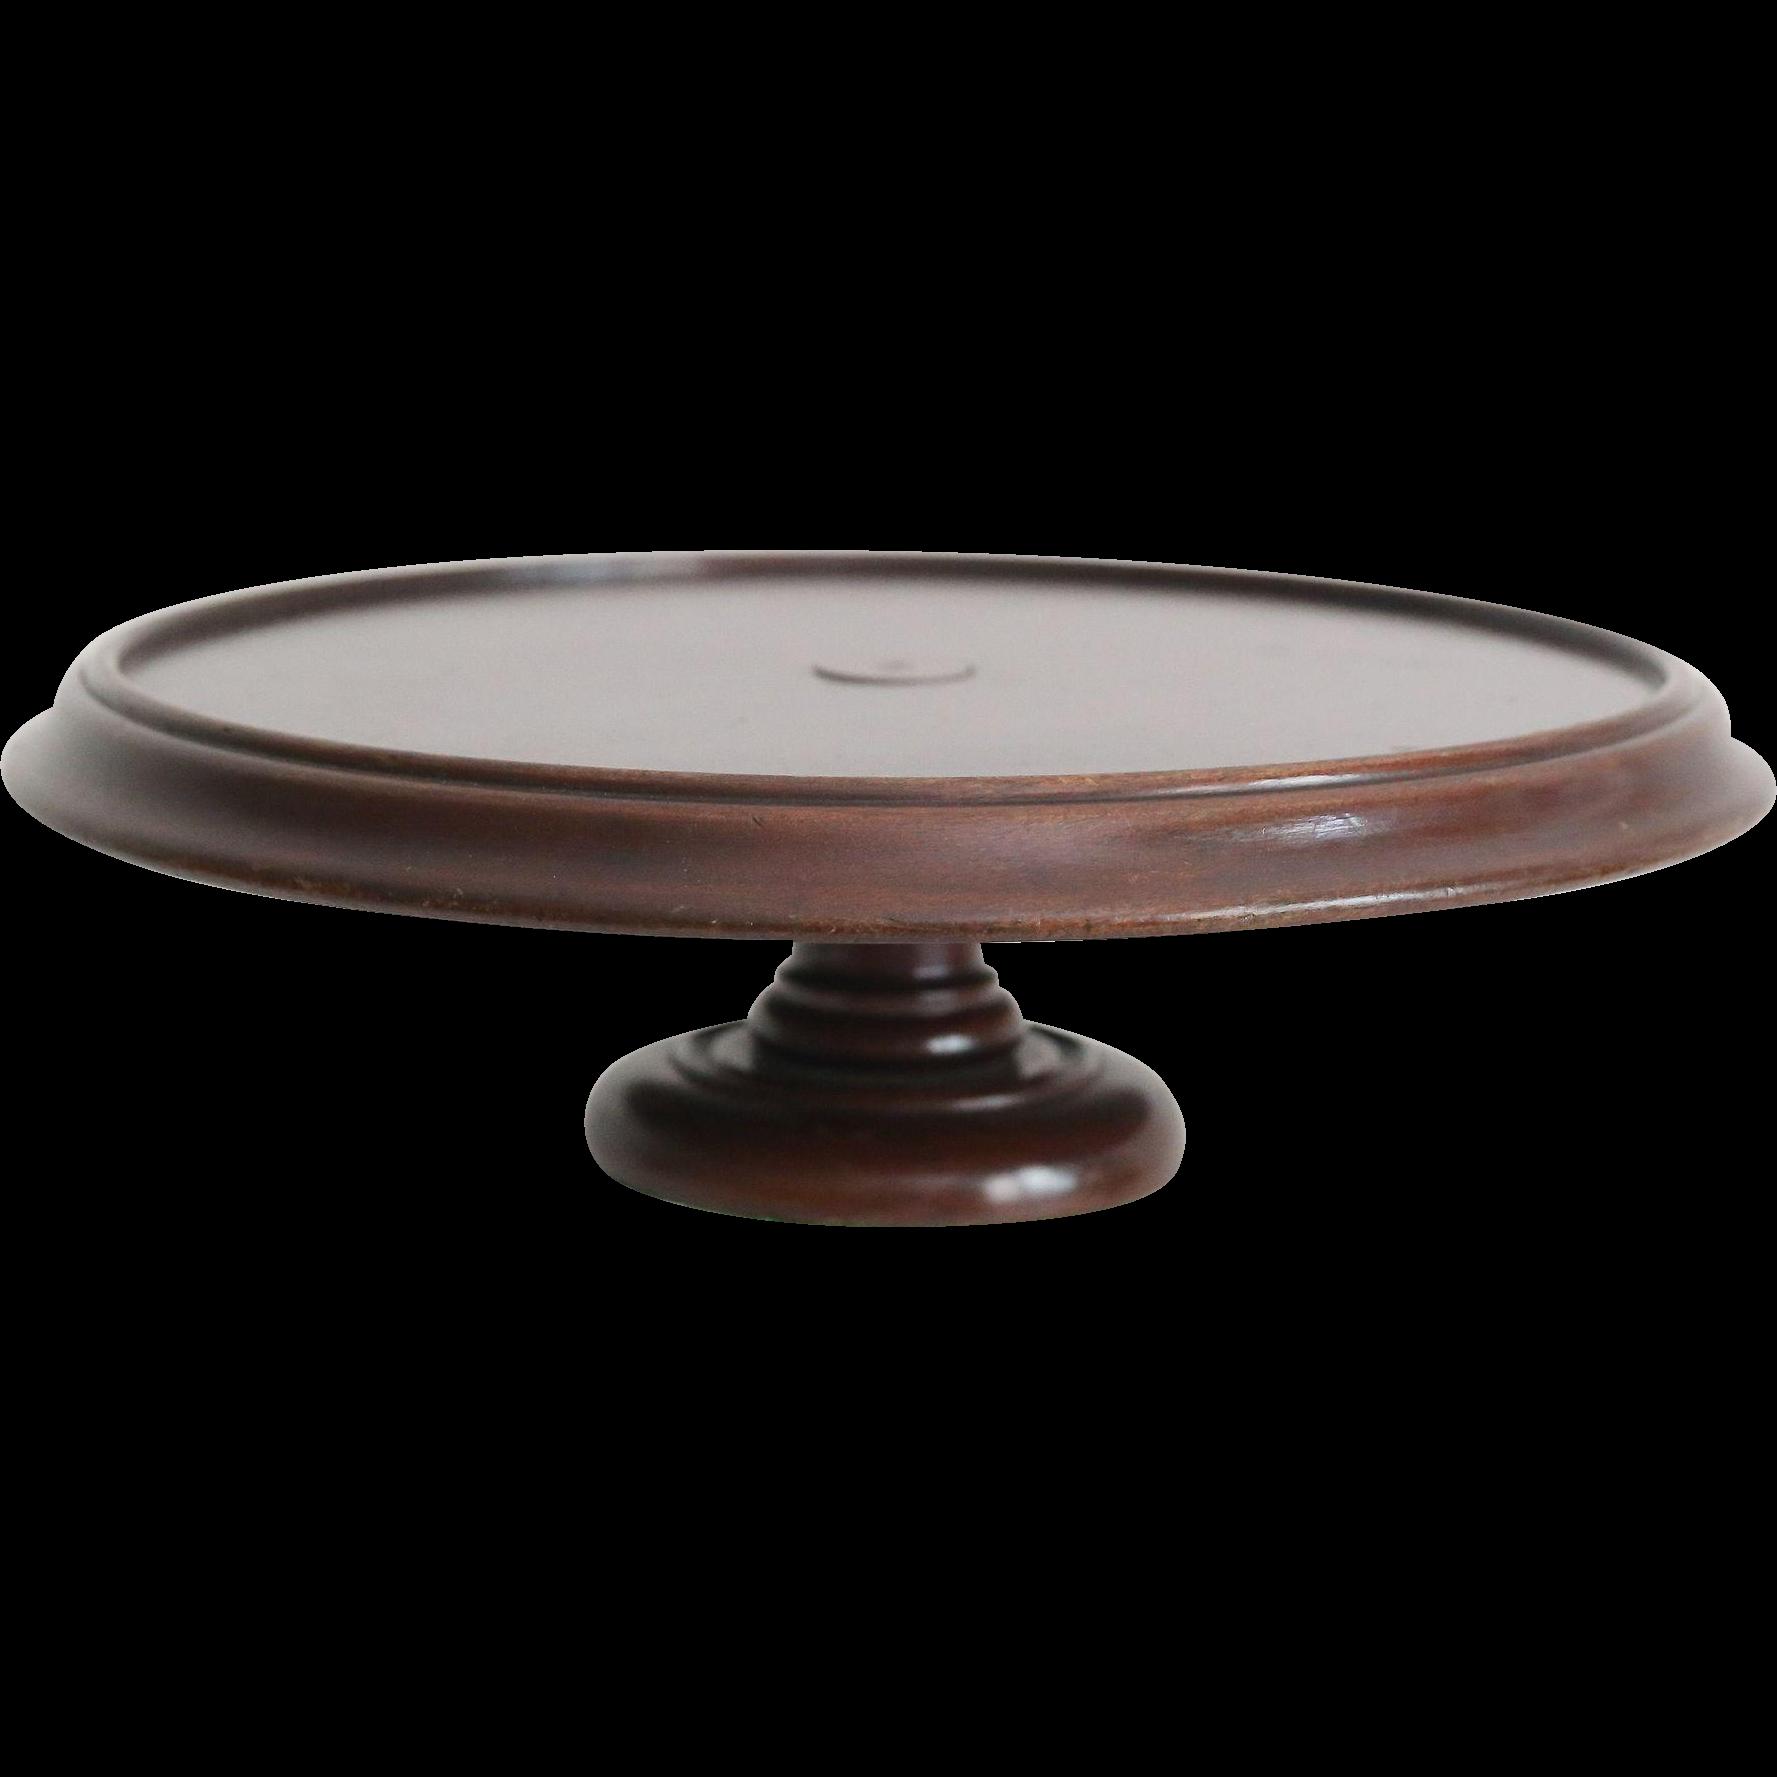 antique revolving tray or lazy susan english mahogany